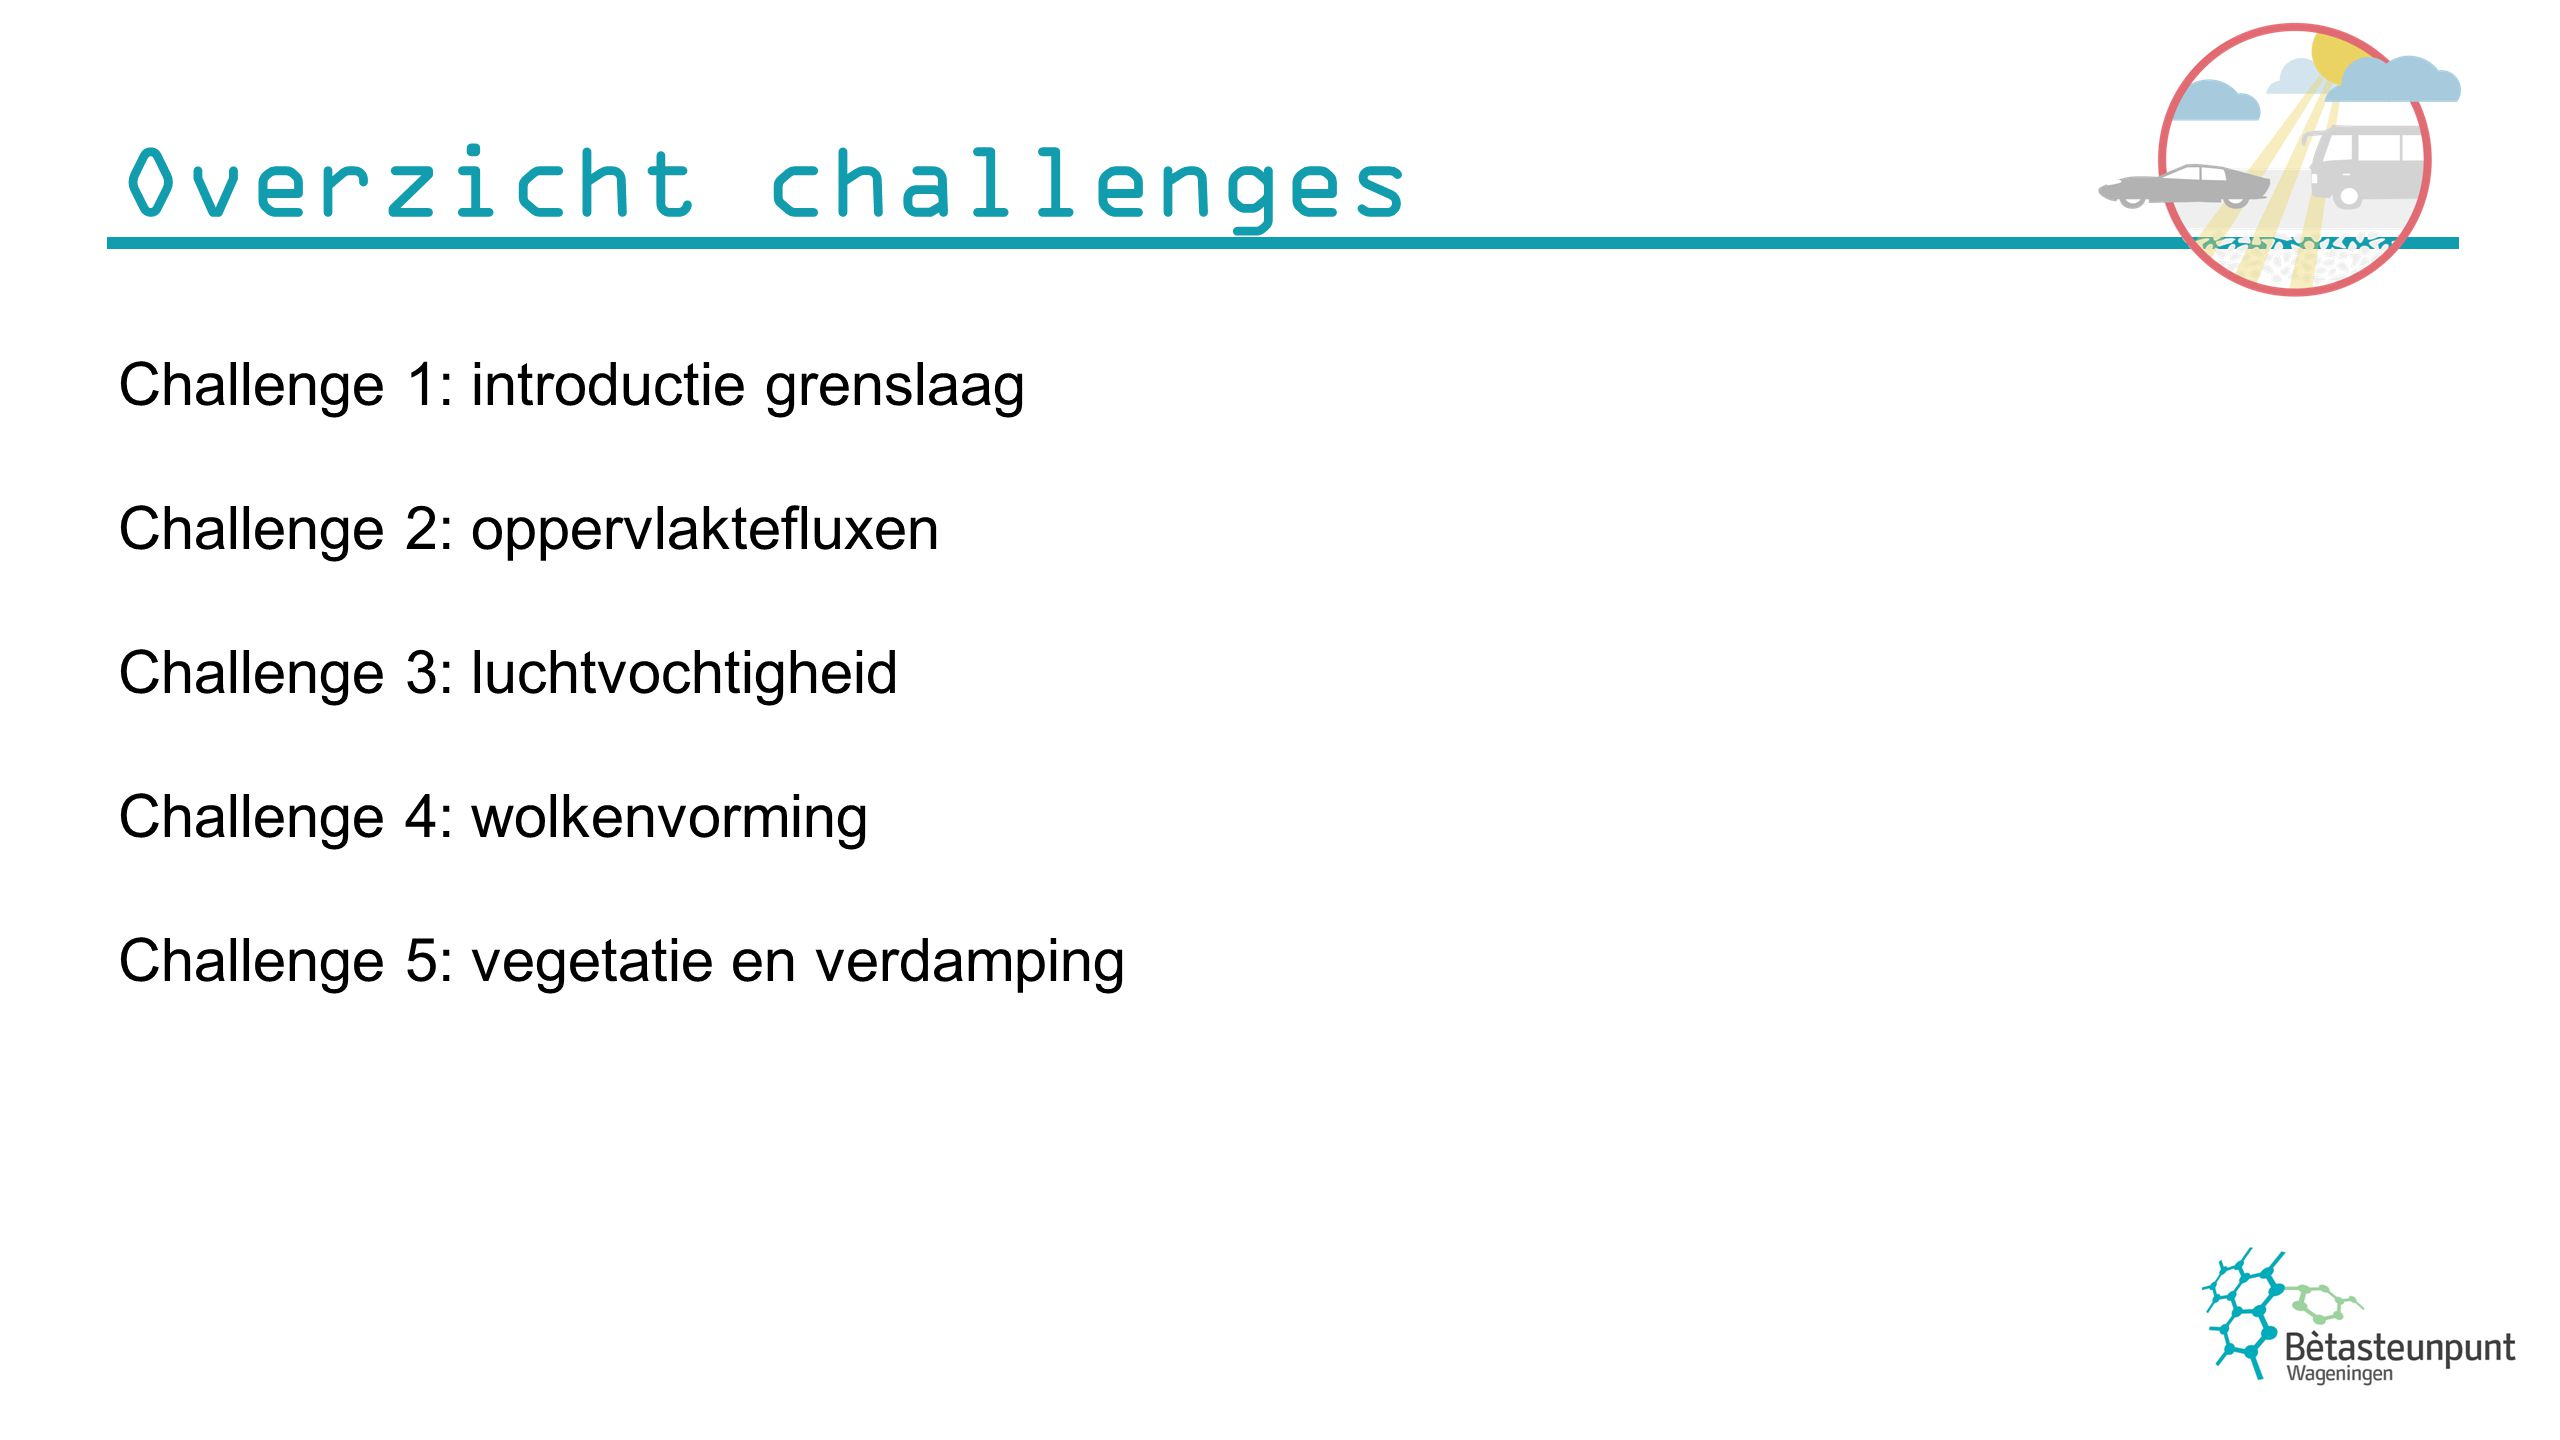 Overzicht challenges